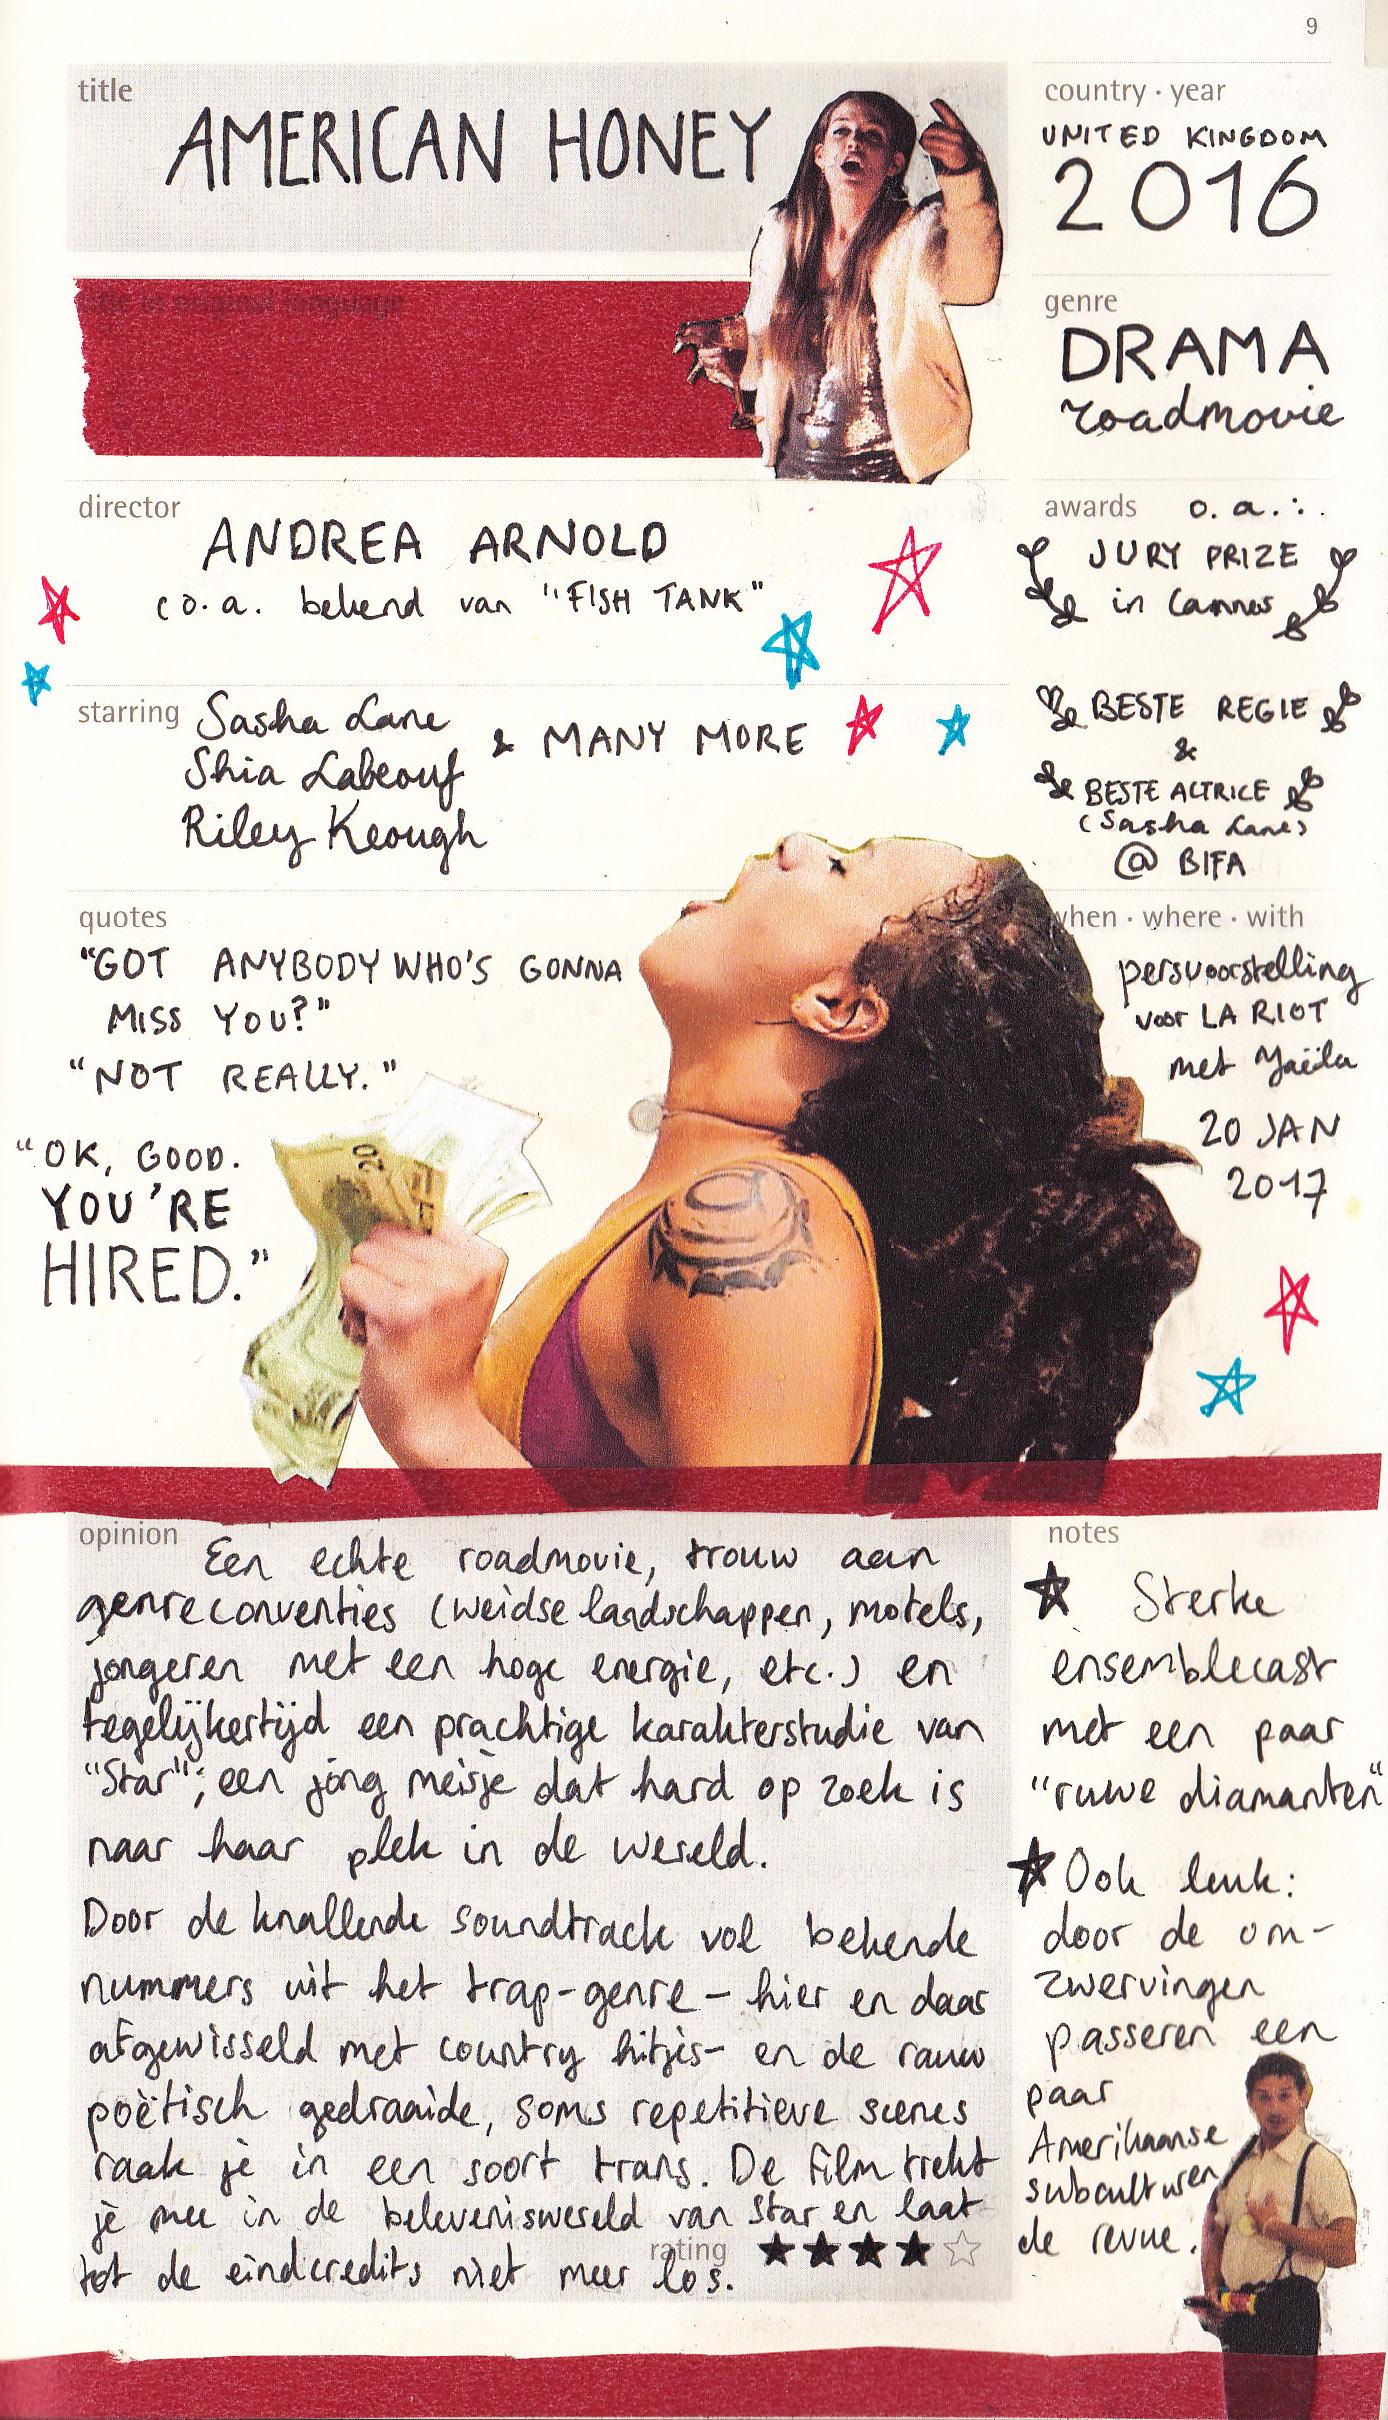 americanhoney-recensie